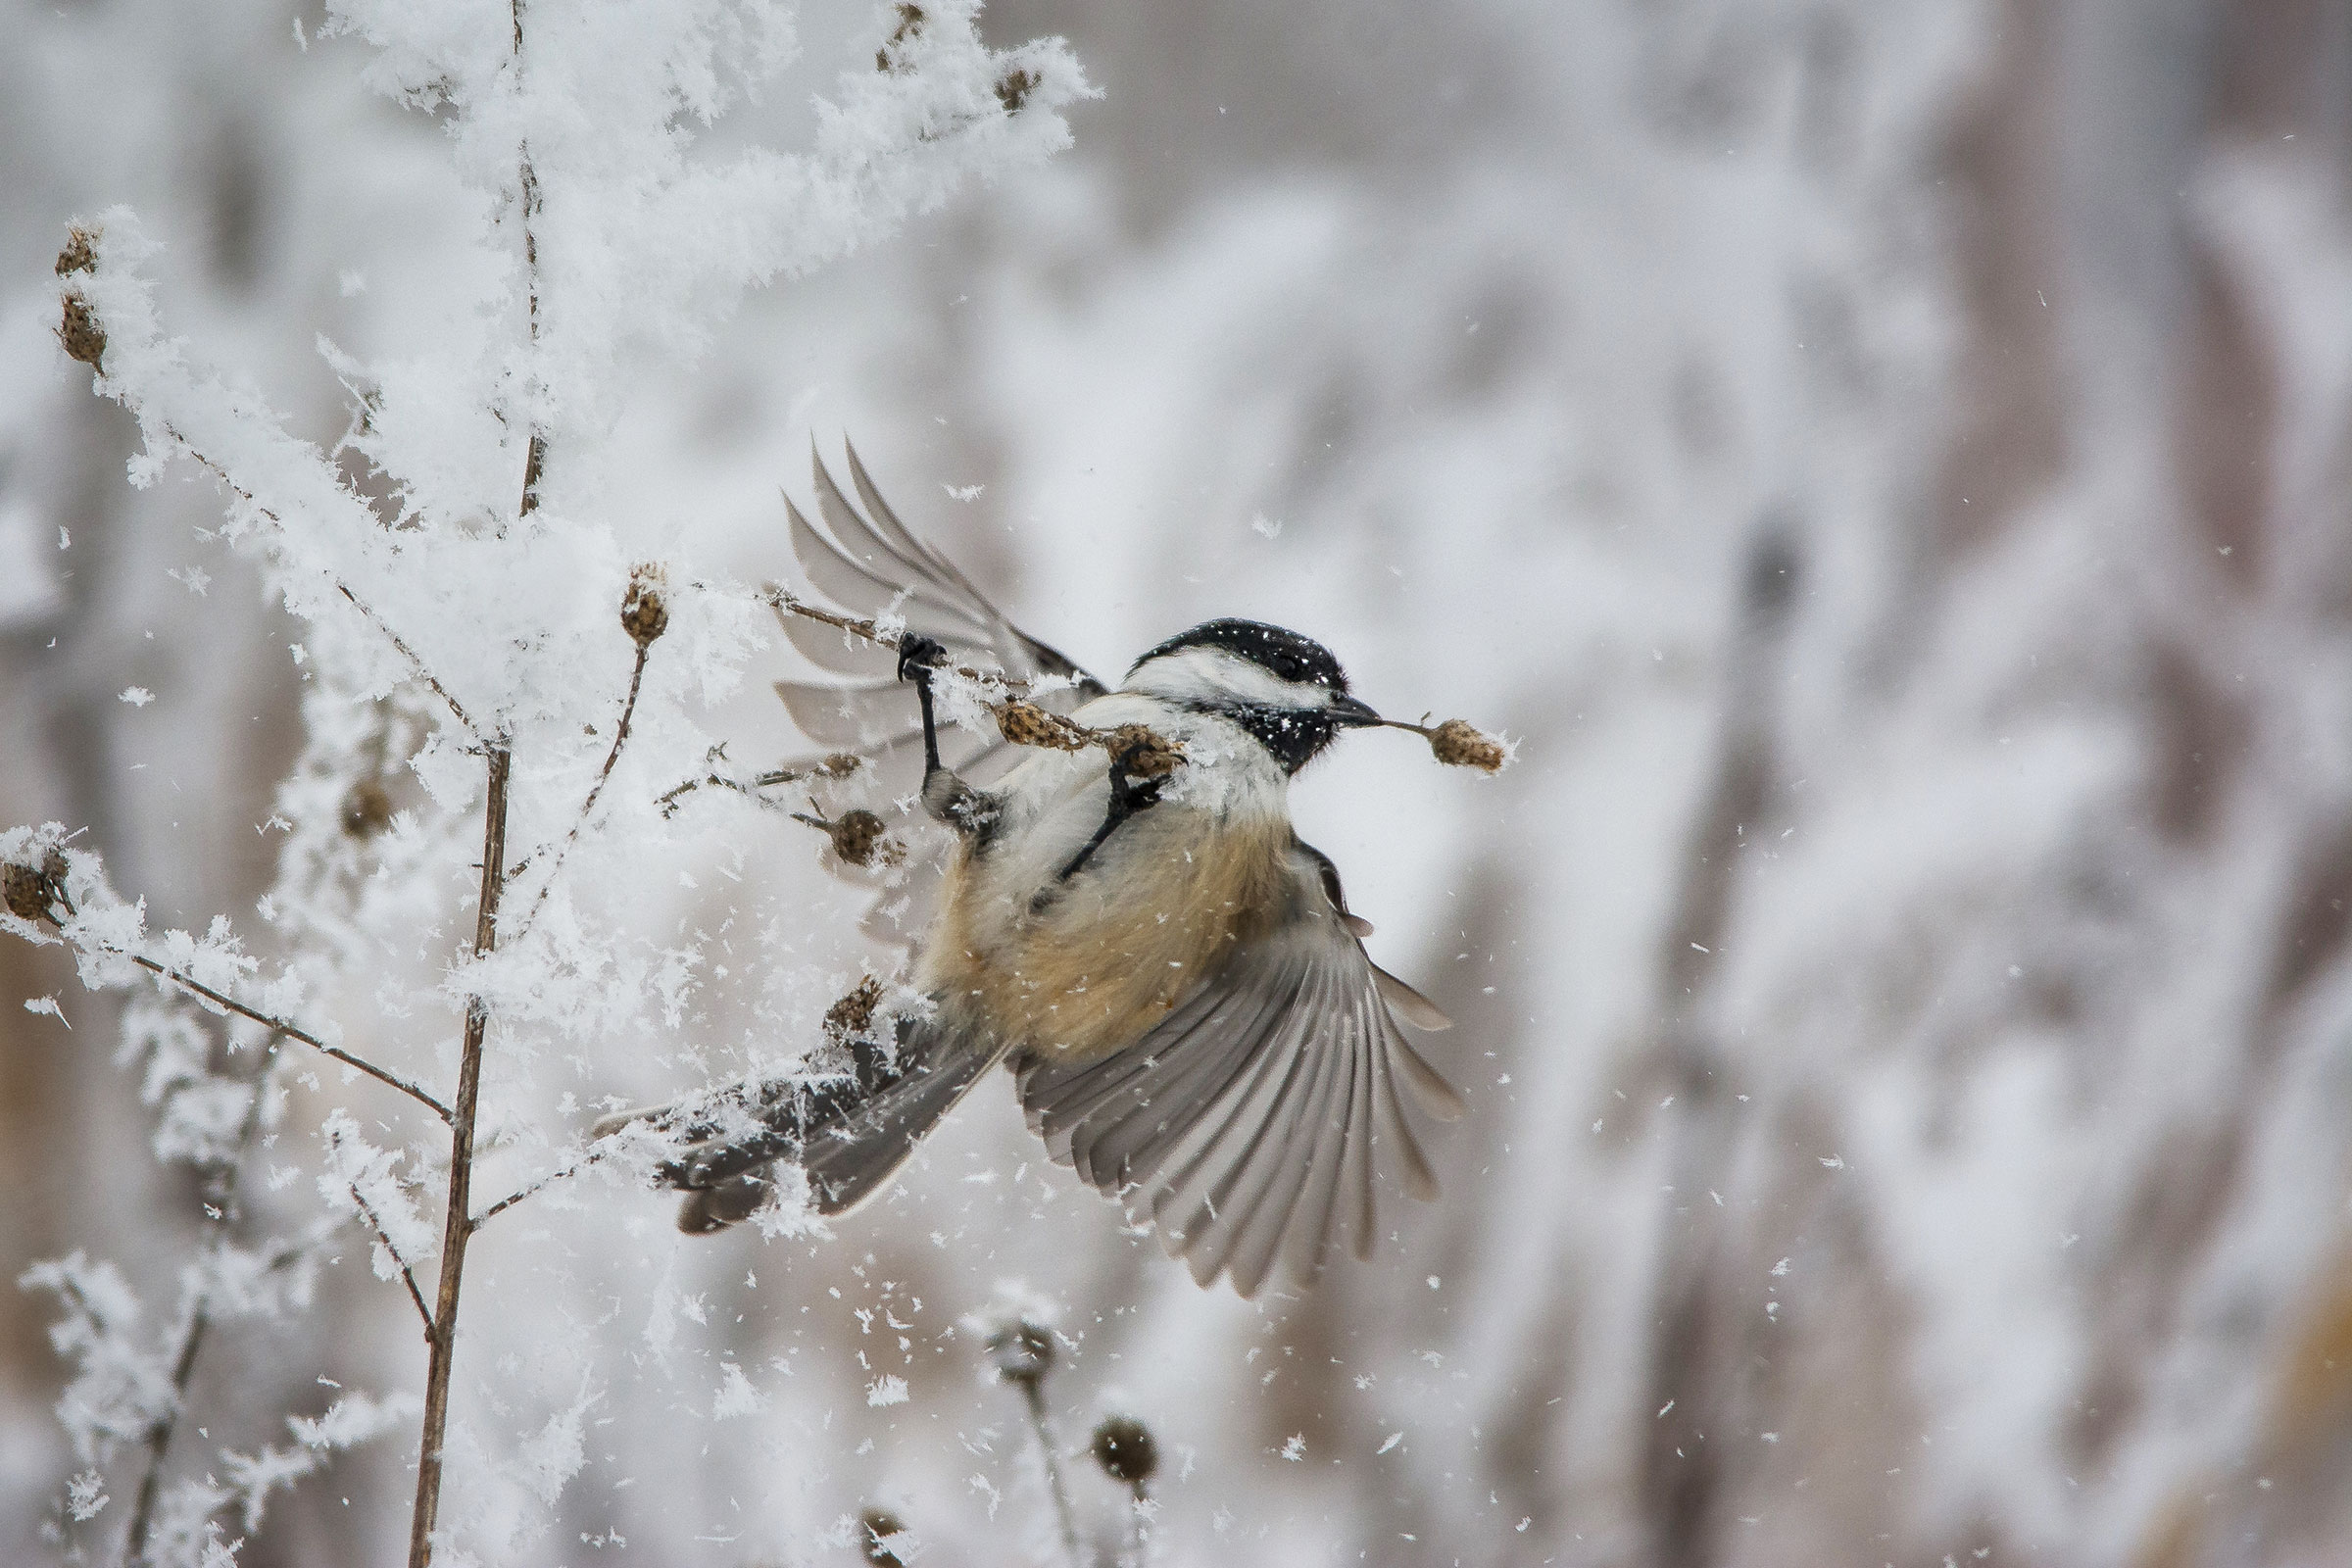 Black-capped Chickadee. Becky O'Neil/Audubon Photography Awards